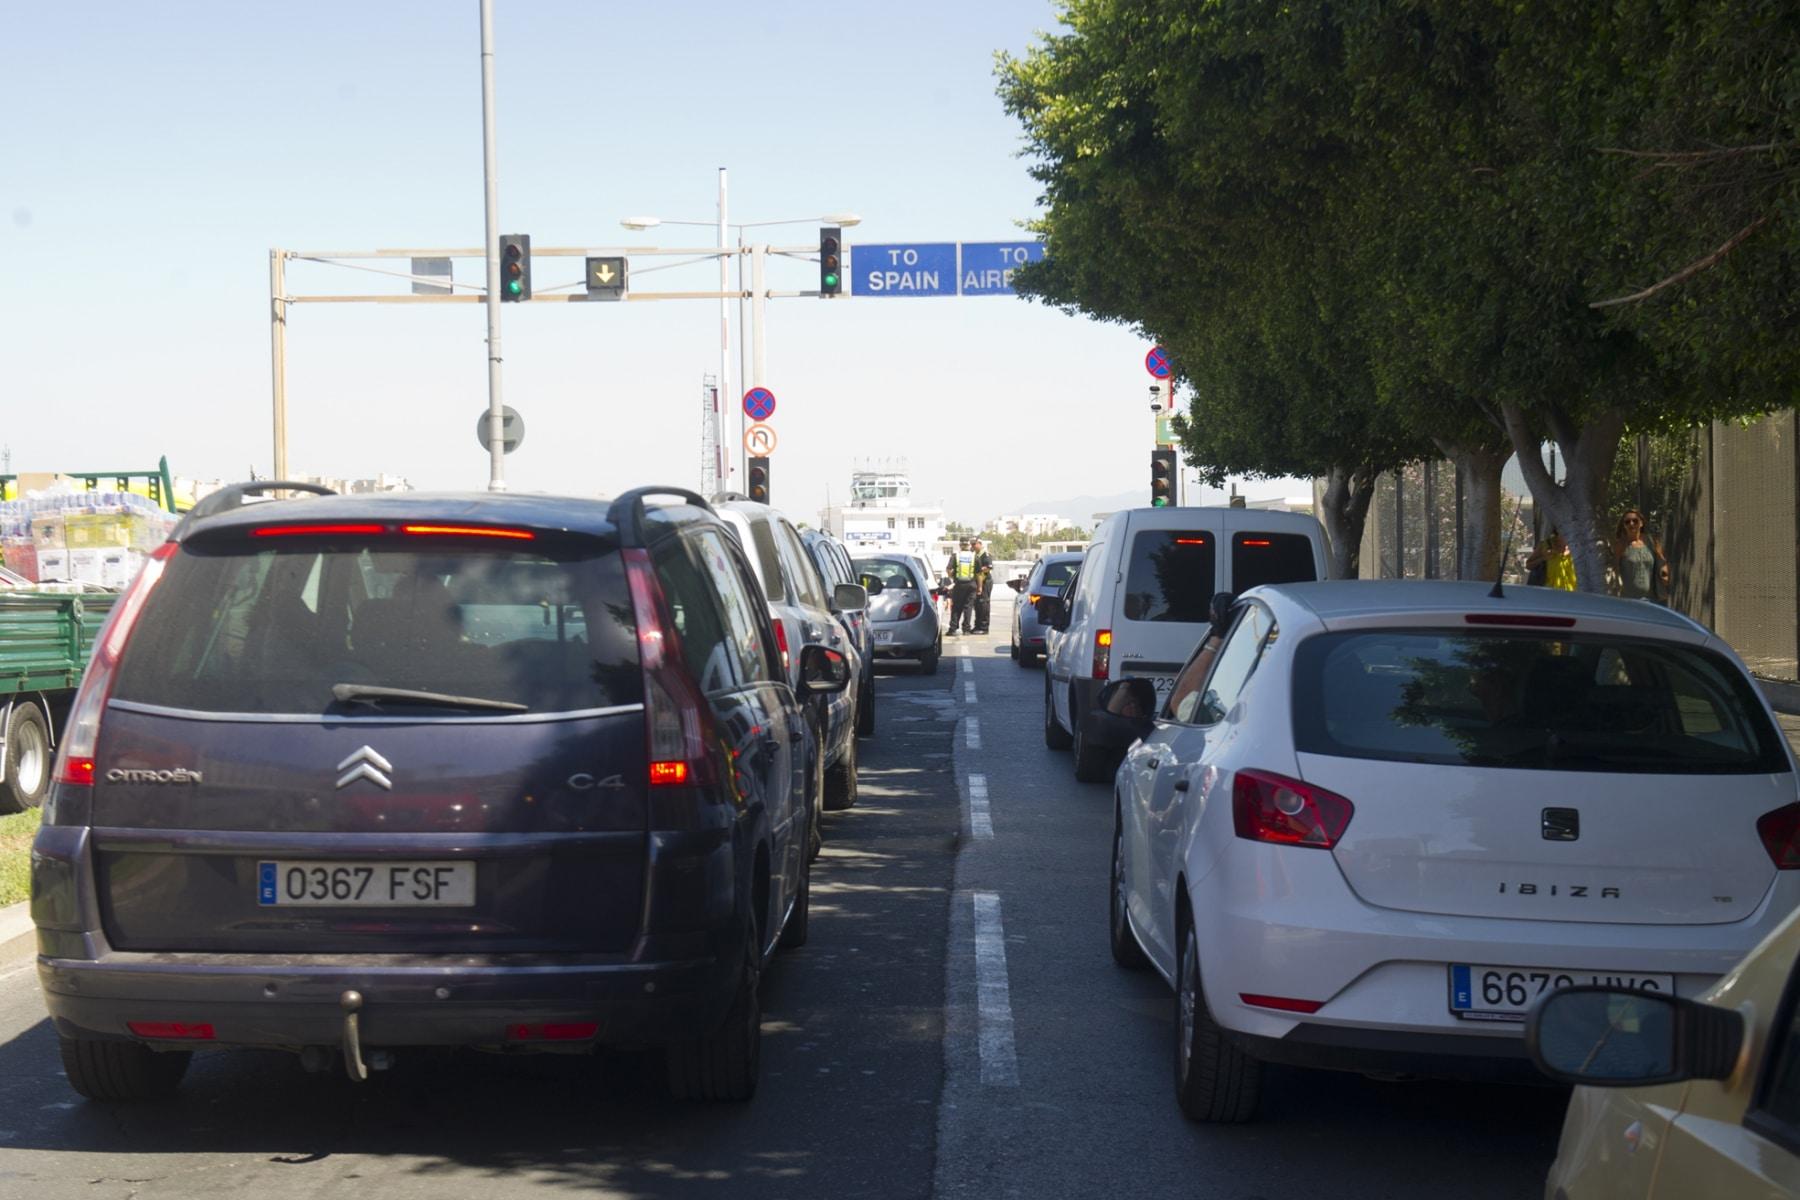 21-agosto-2014-colas-de-entrada-y-salida-de-gibraltar17_14989375162_o